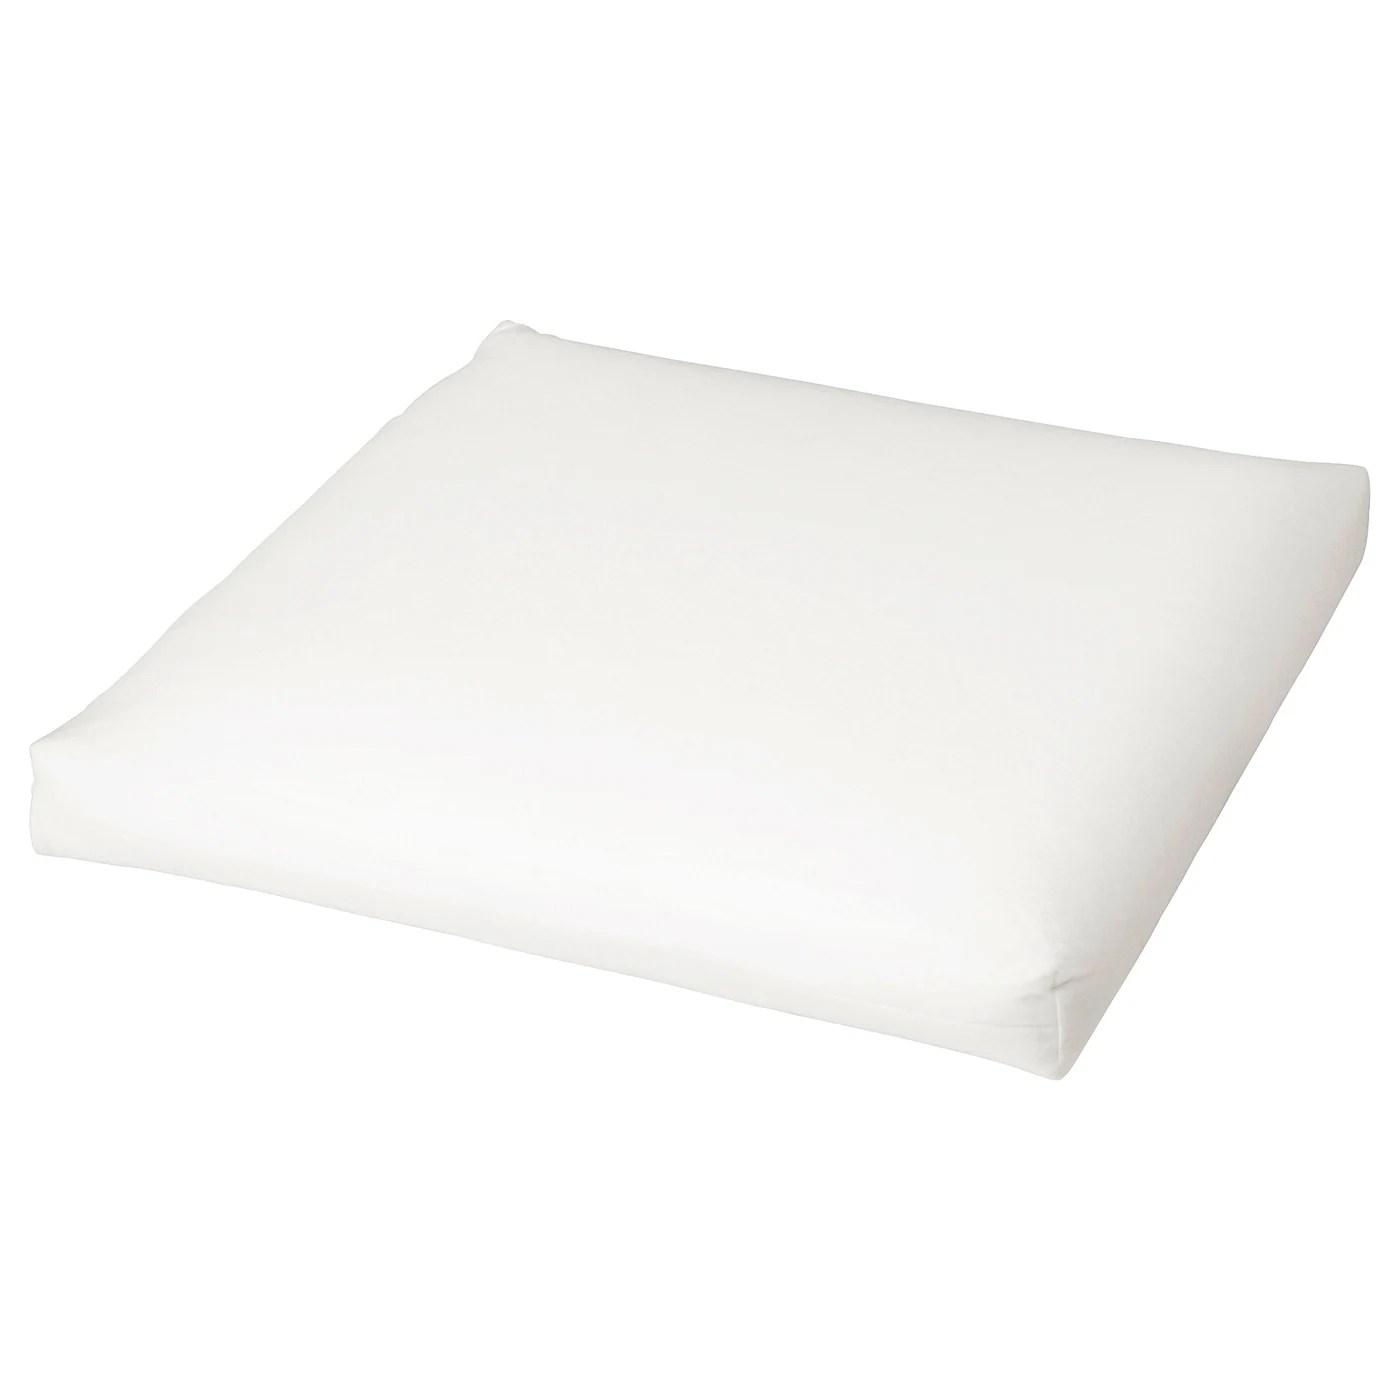 duvholmen inner chair pad outdoor white 17 3 8x17 3 8